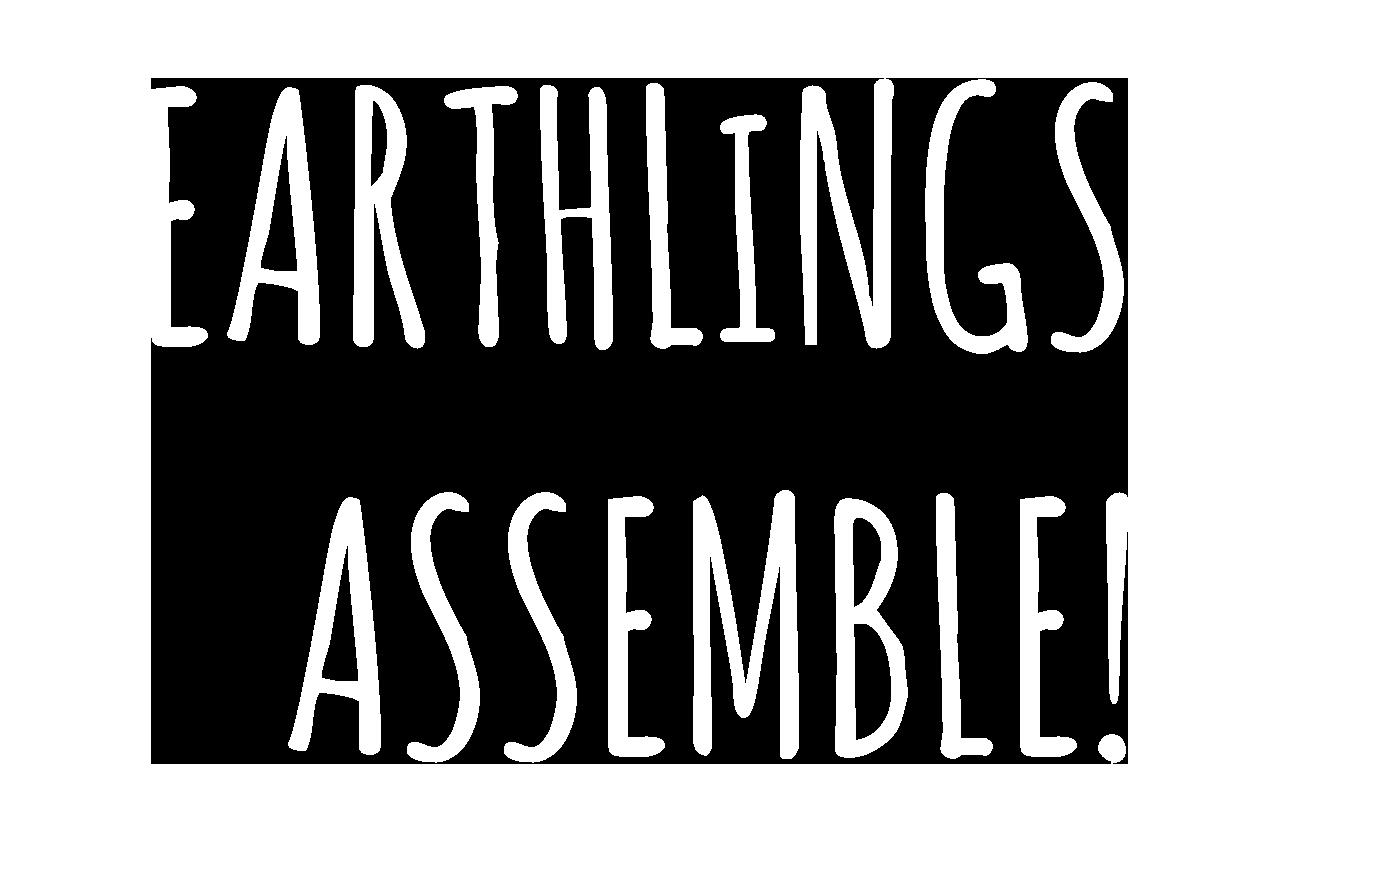 Earthlings Assemble!